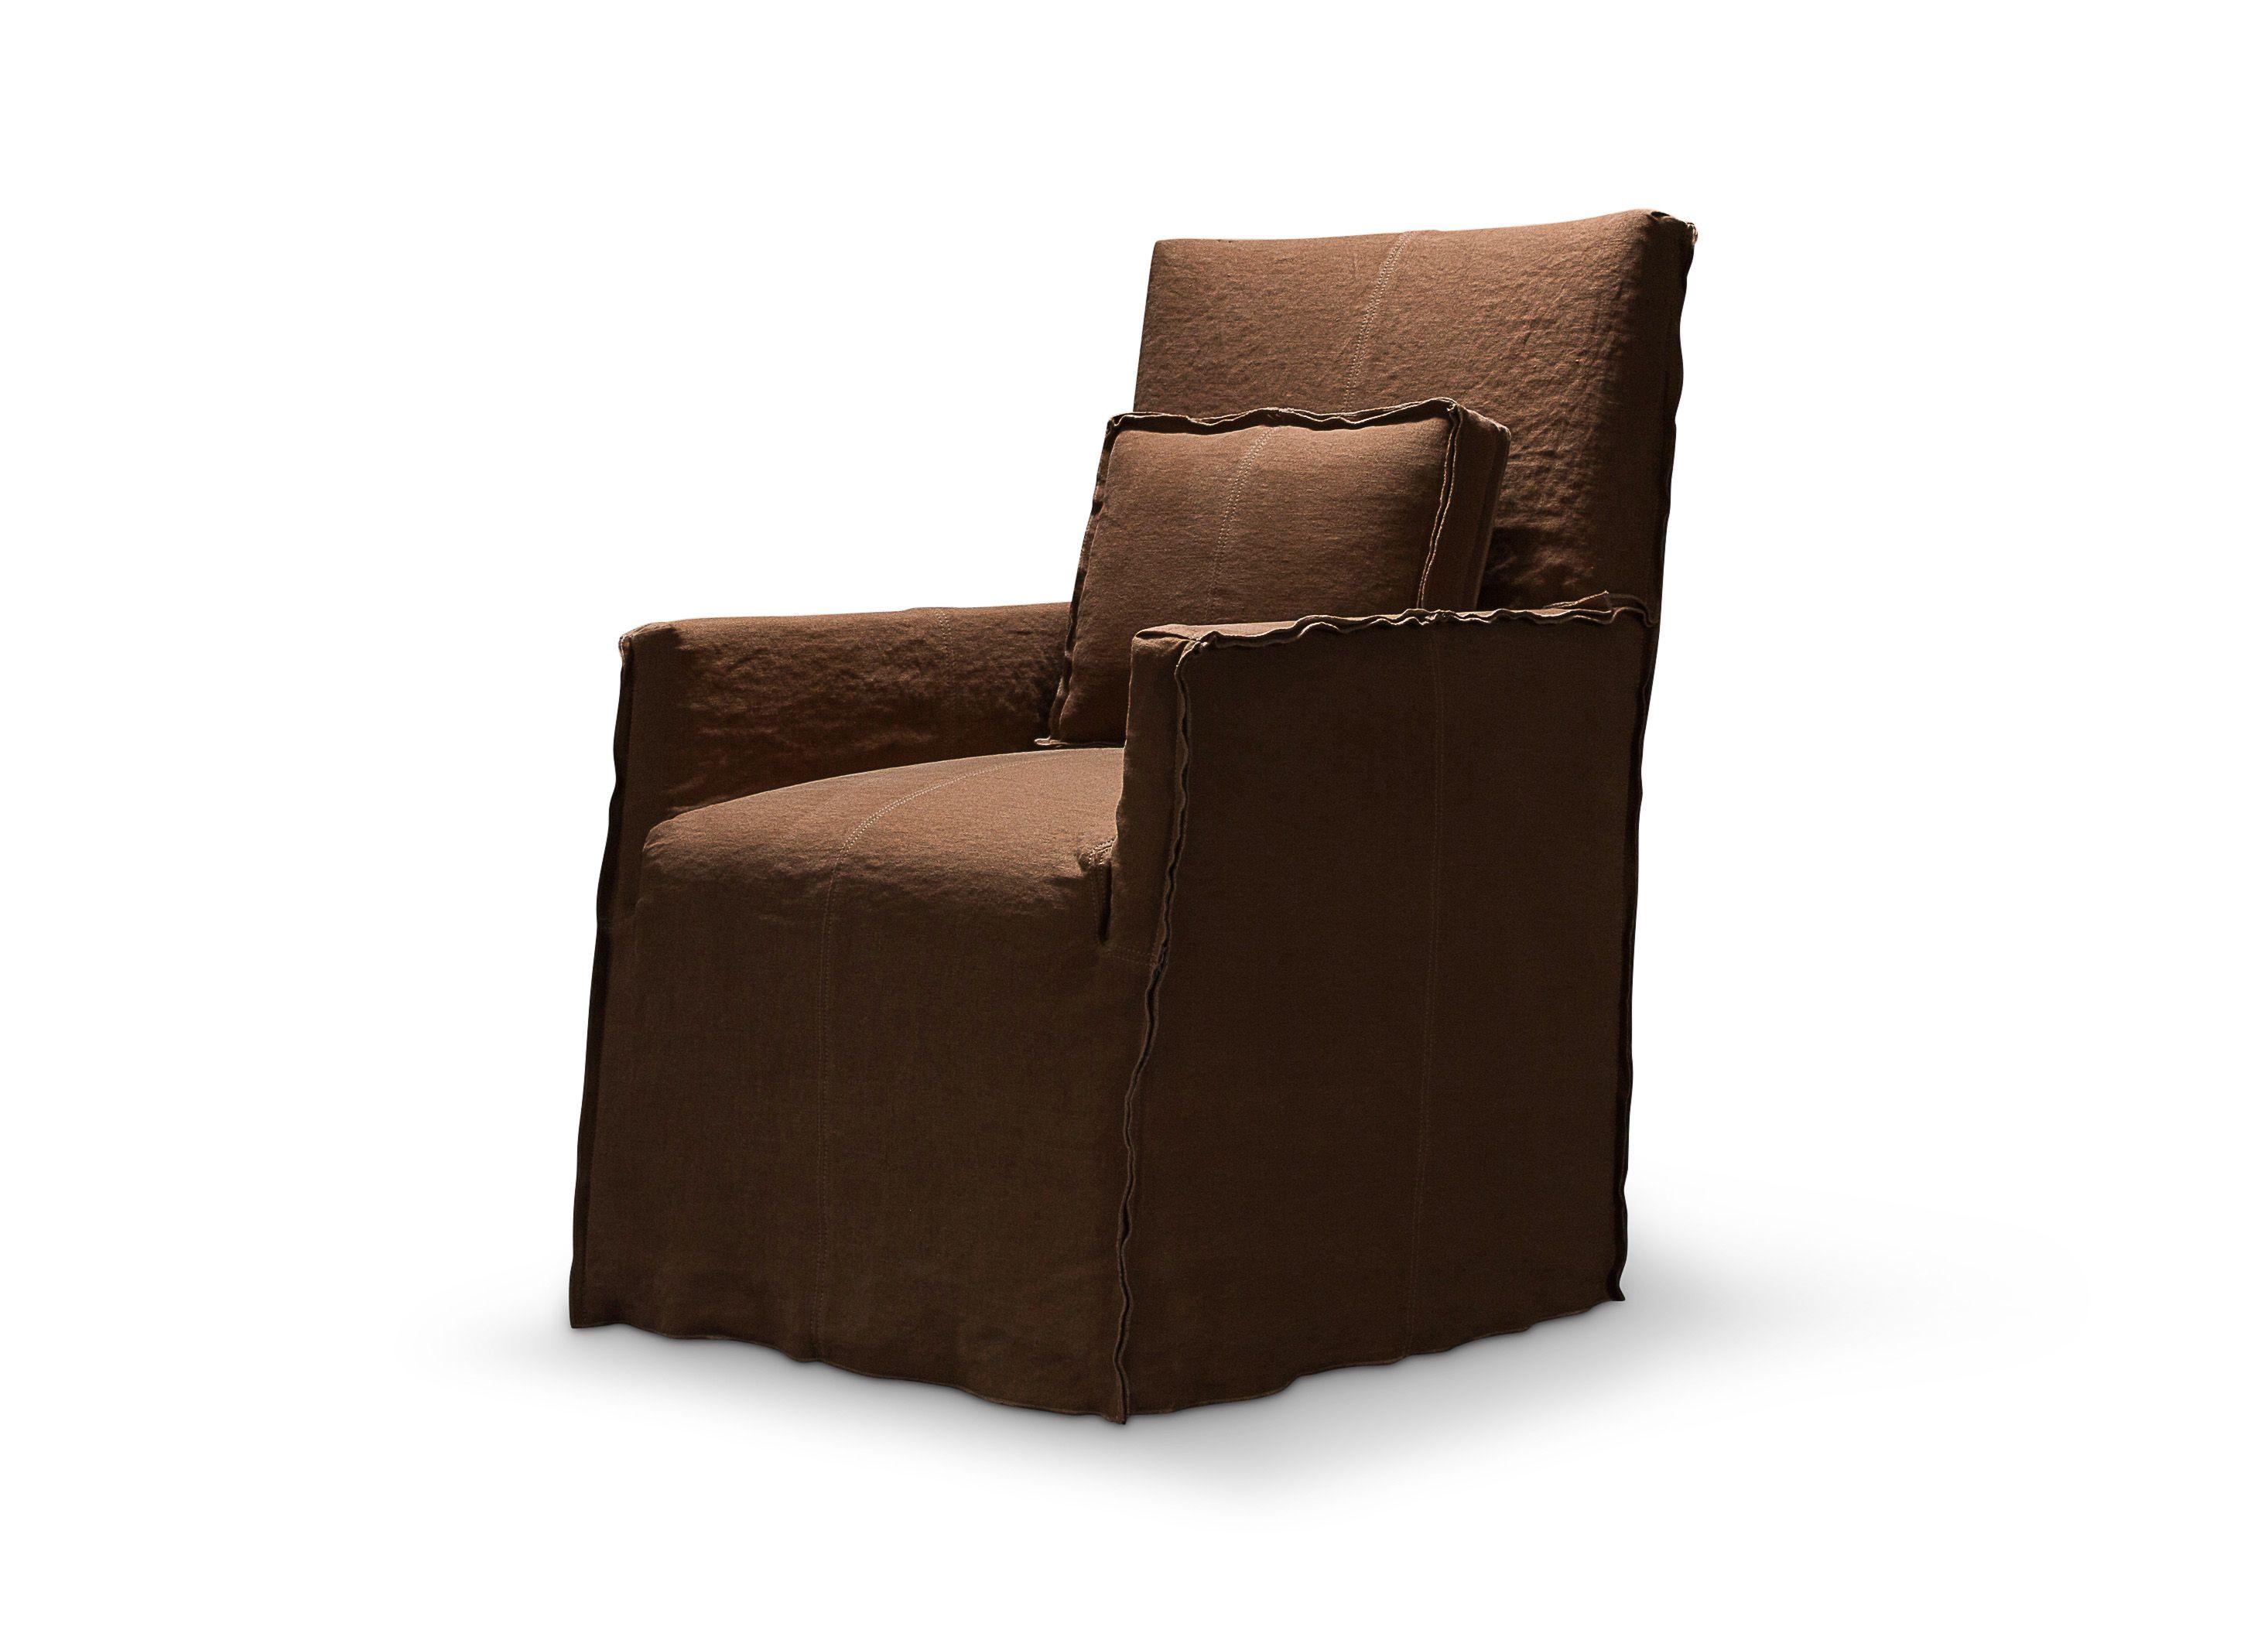 Alois Swivel Dining Chair